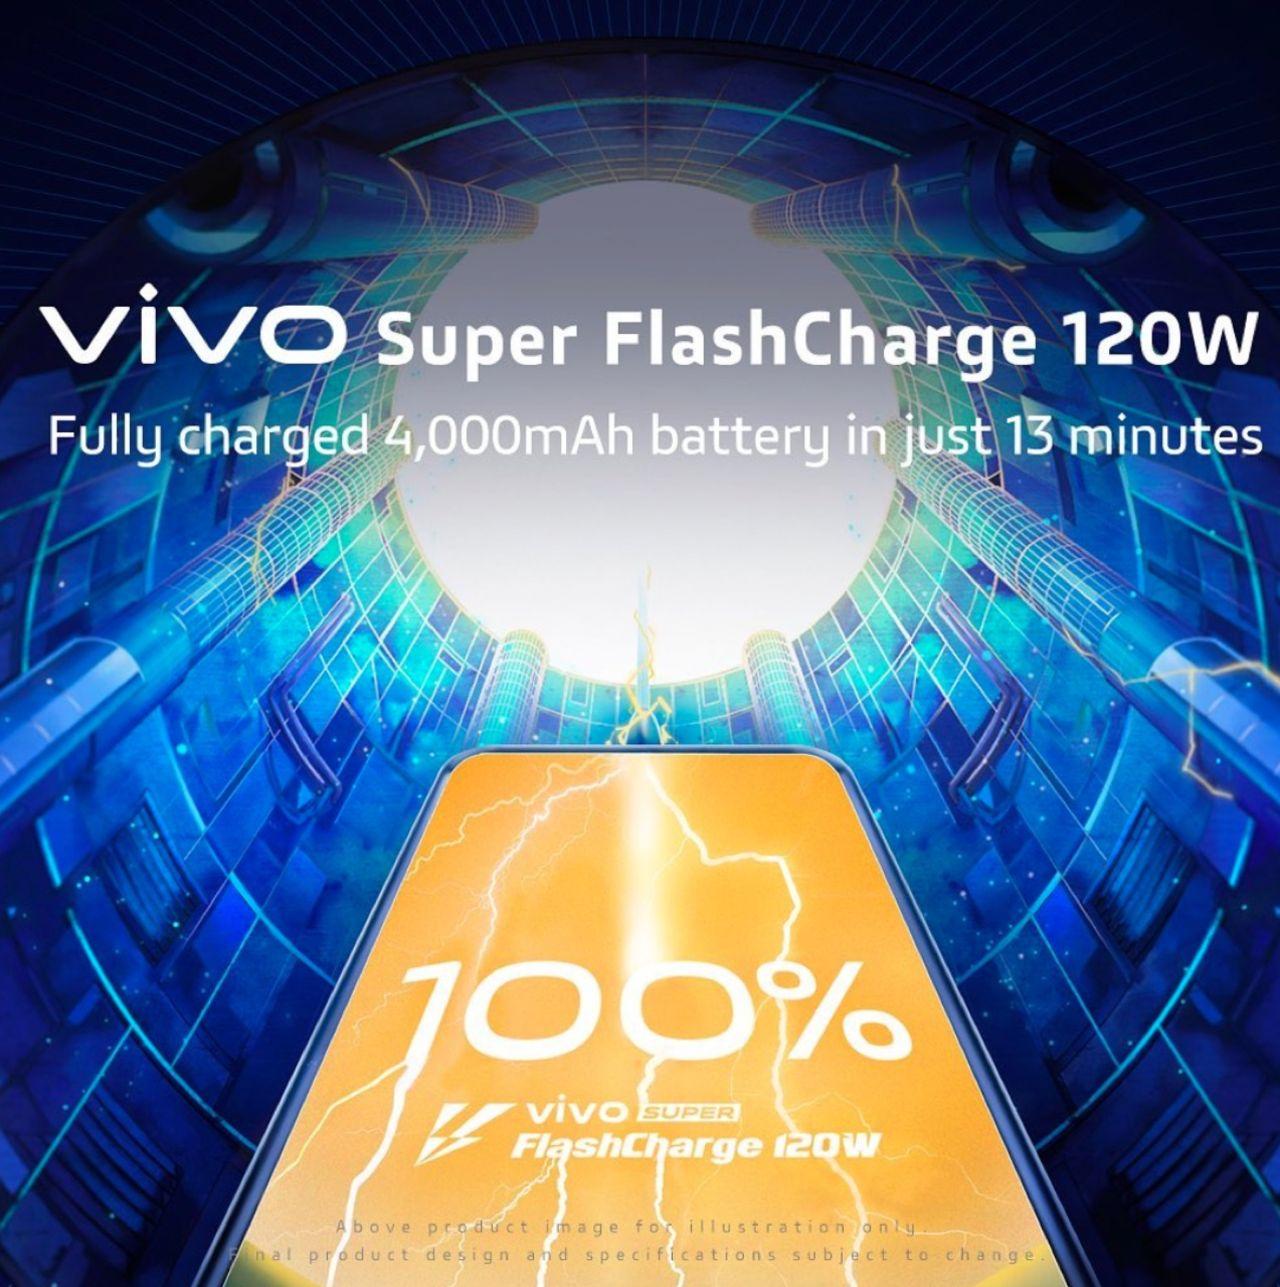 Vivo utlovar fulladdat mobilbatteri på 13 minuter